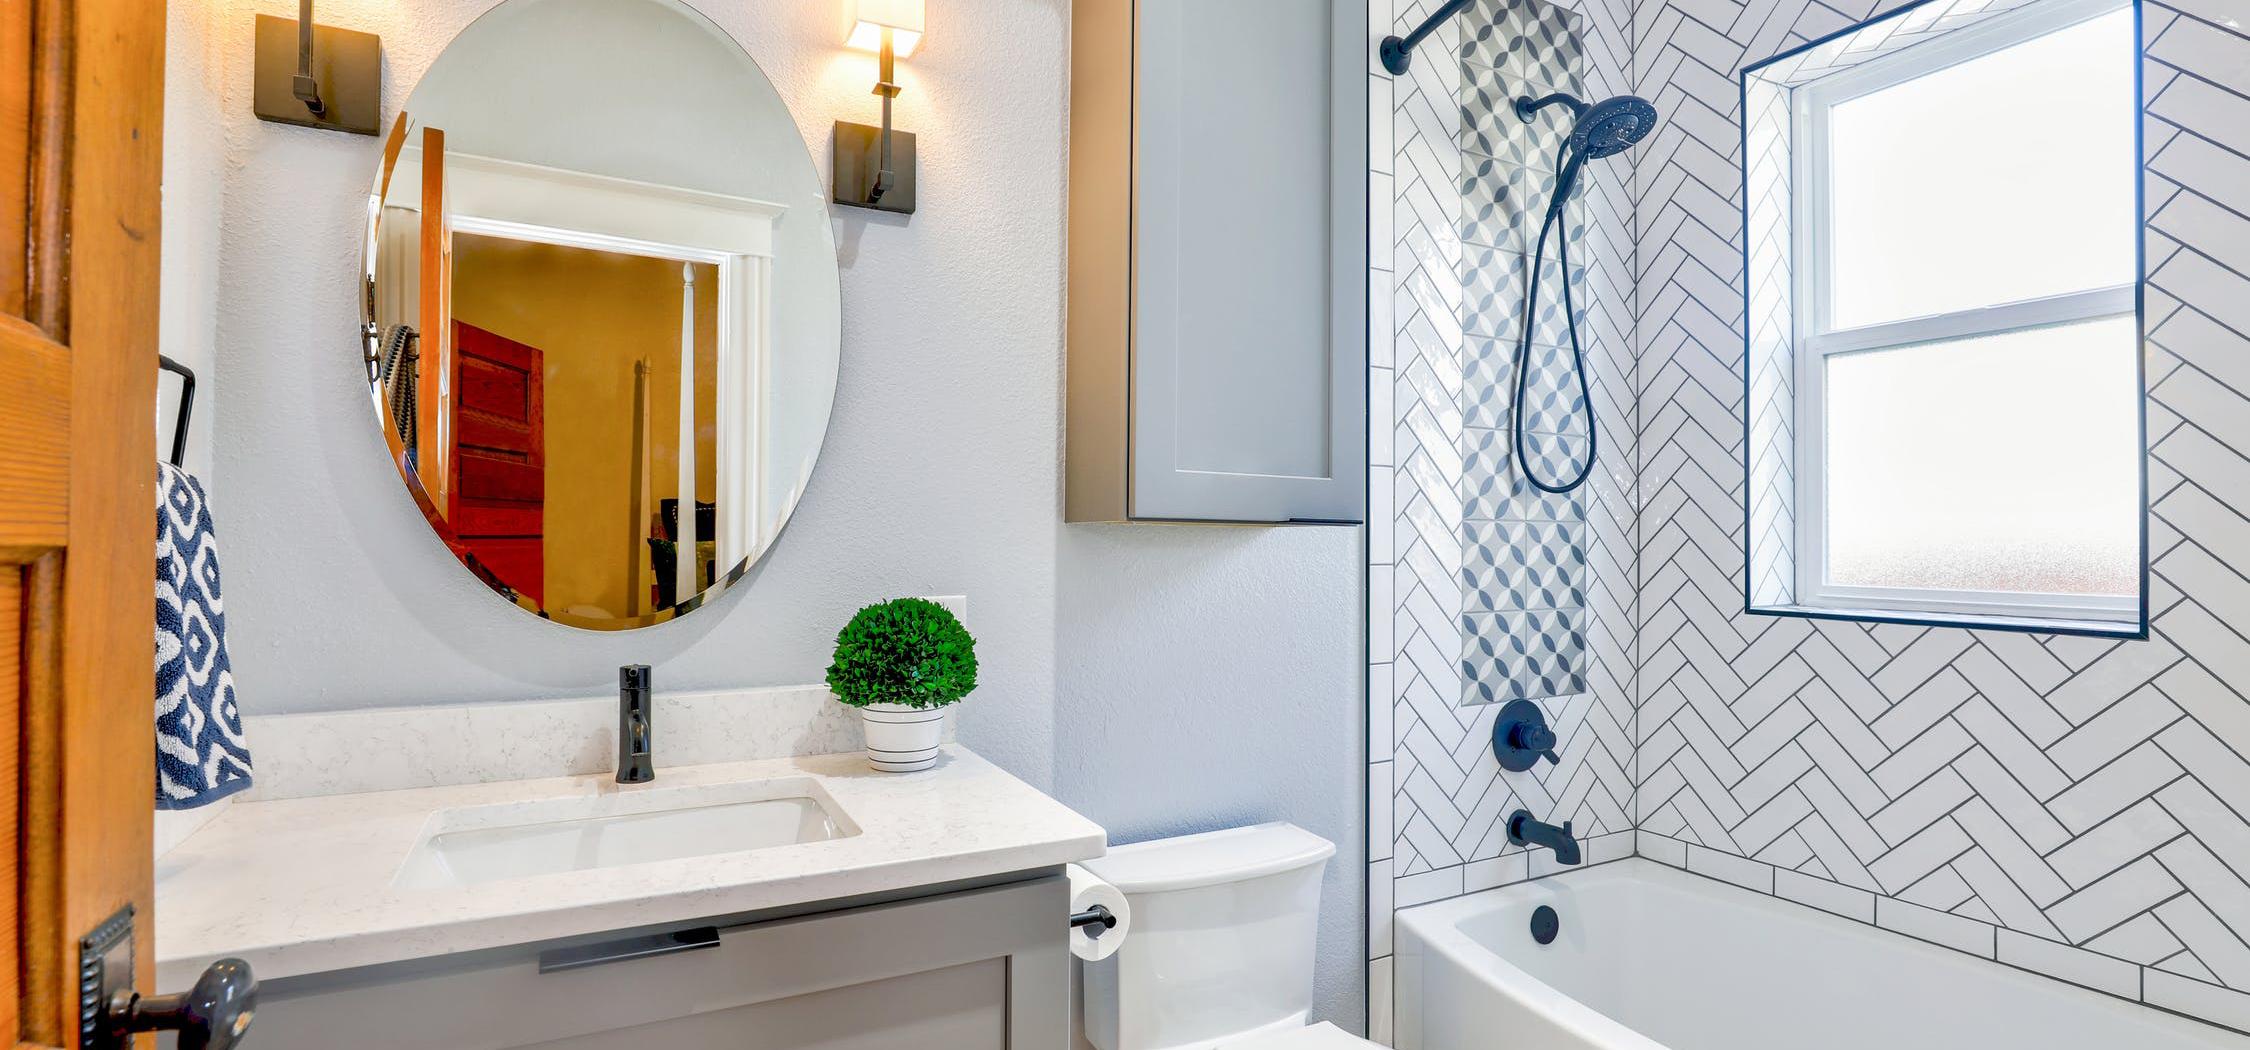 7-tips-for-renovating-your-bathroom-1.jpeg